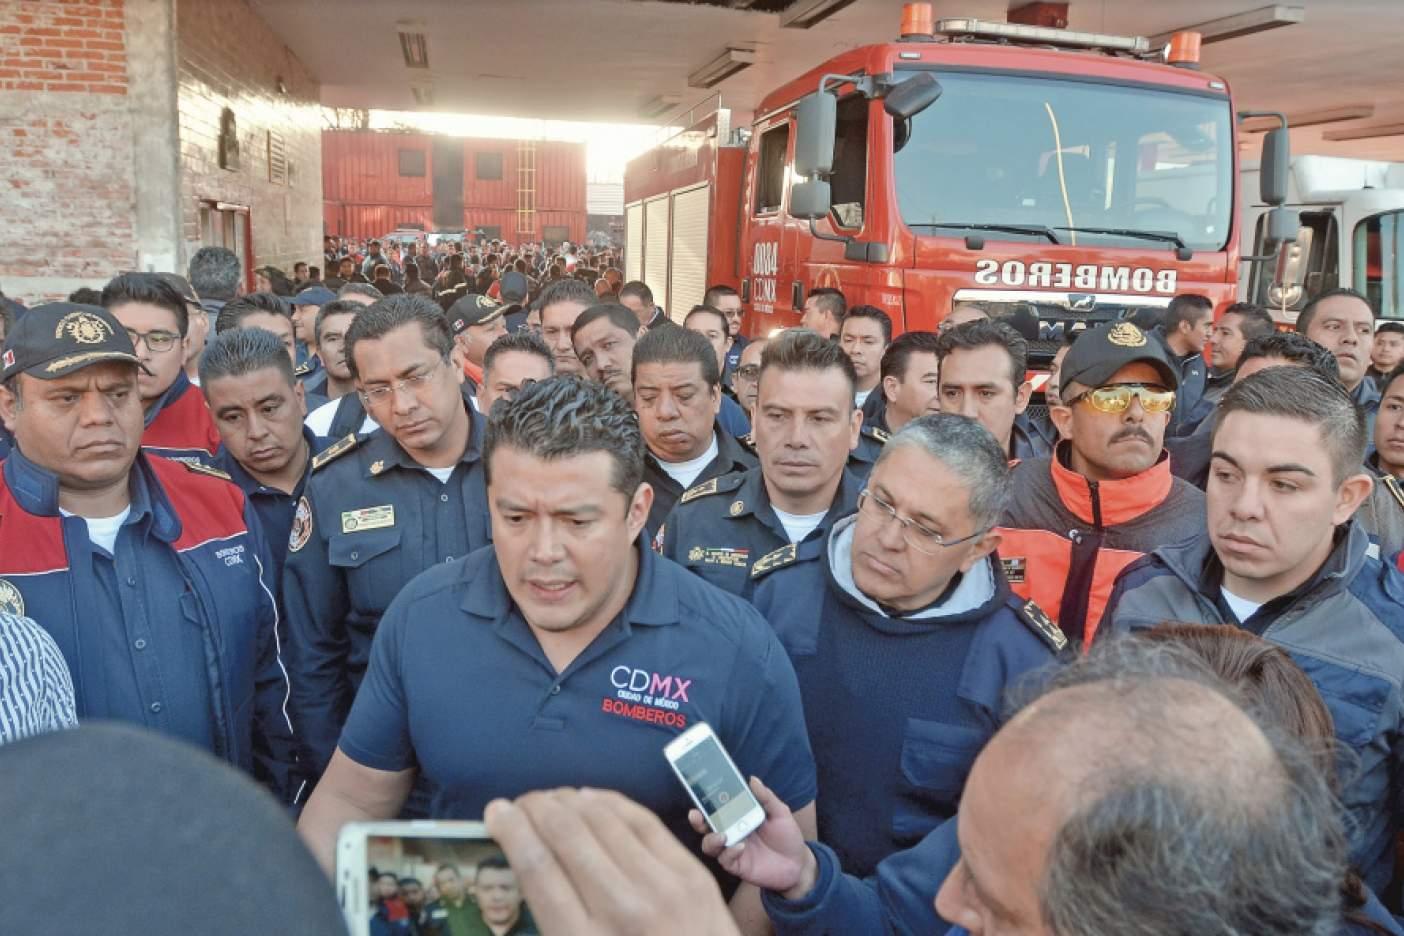 Líder de bomberos está fuera de riesgo: Amieva